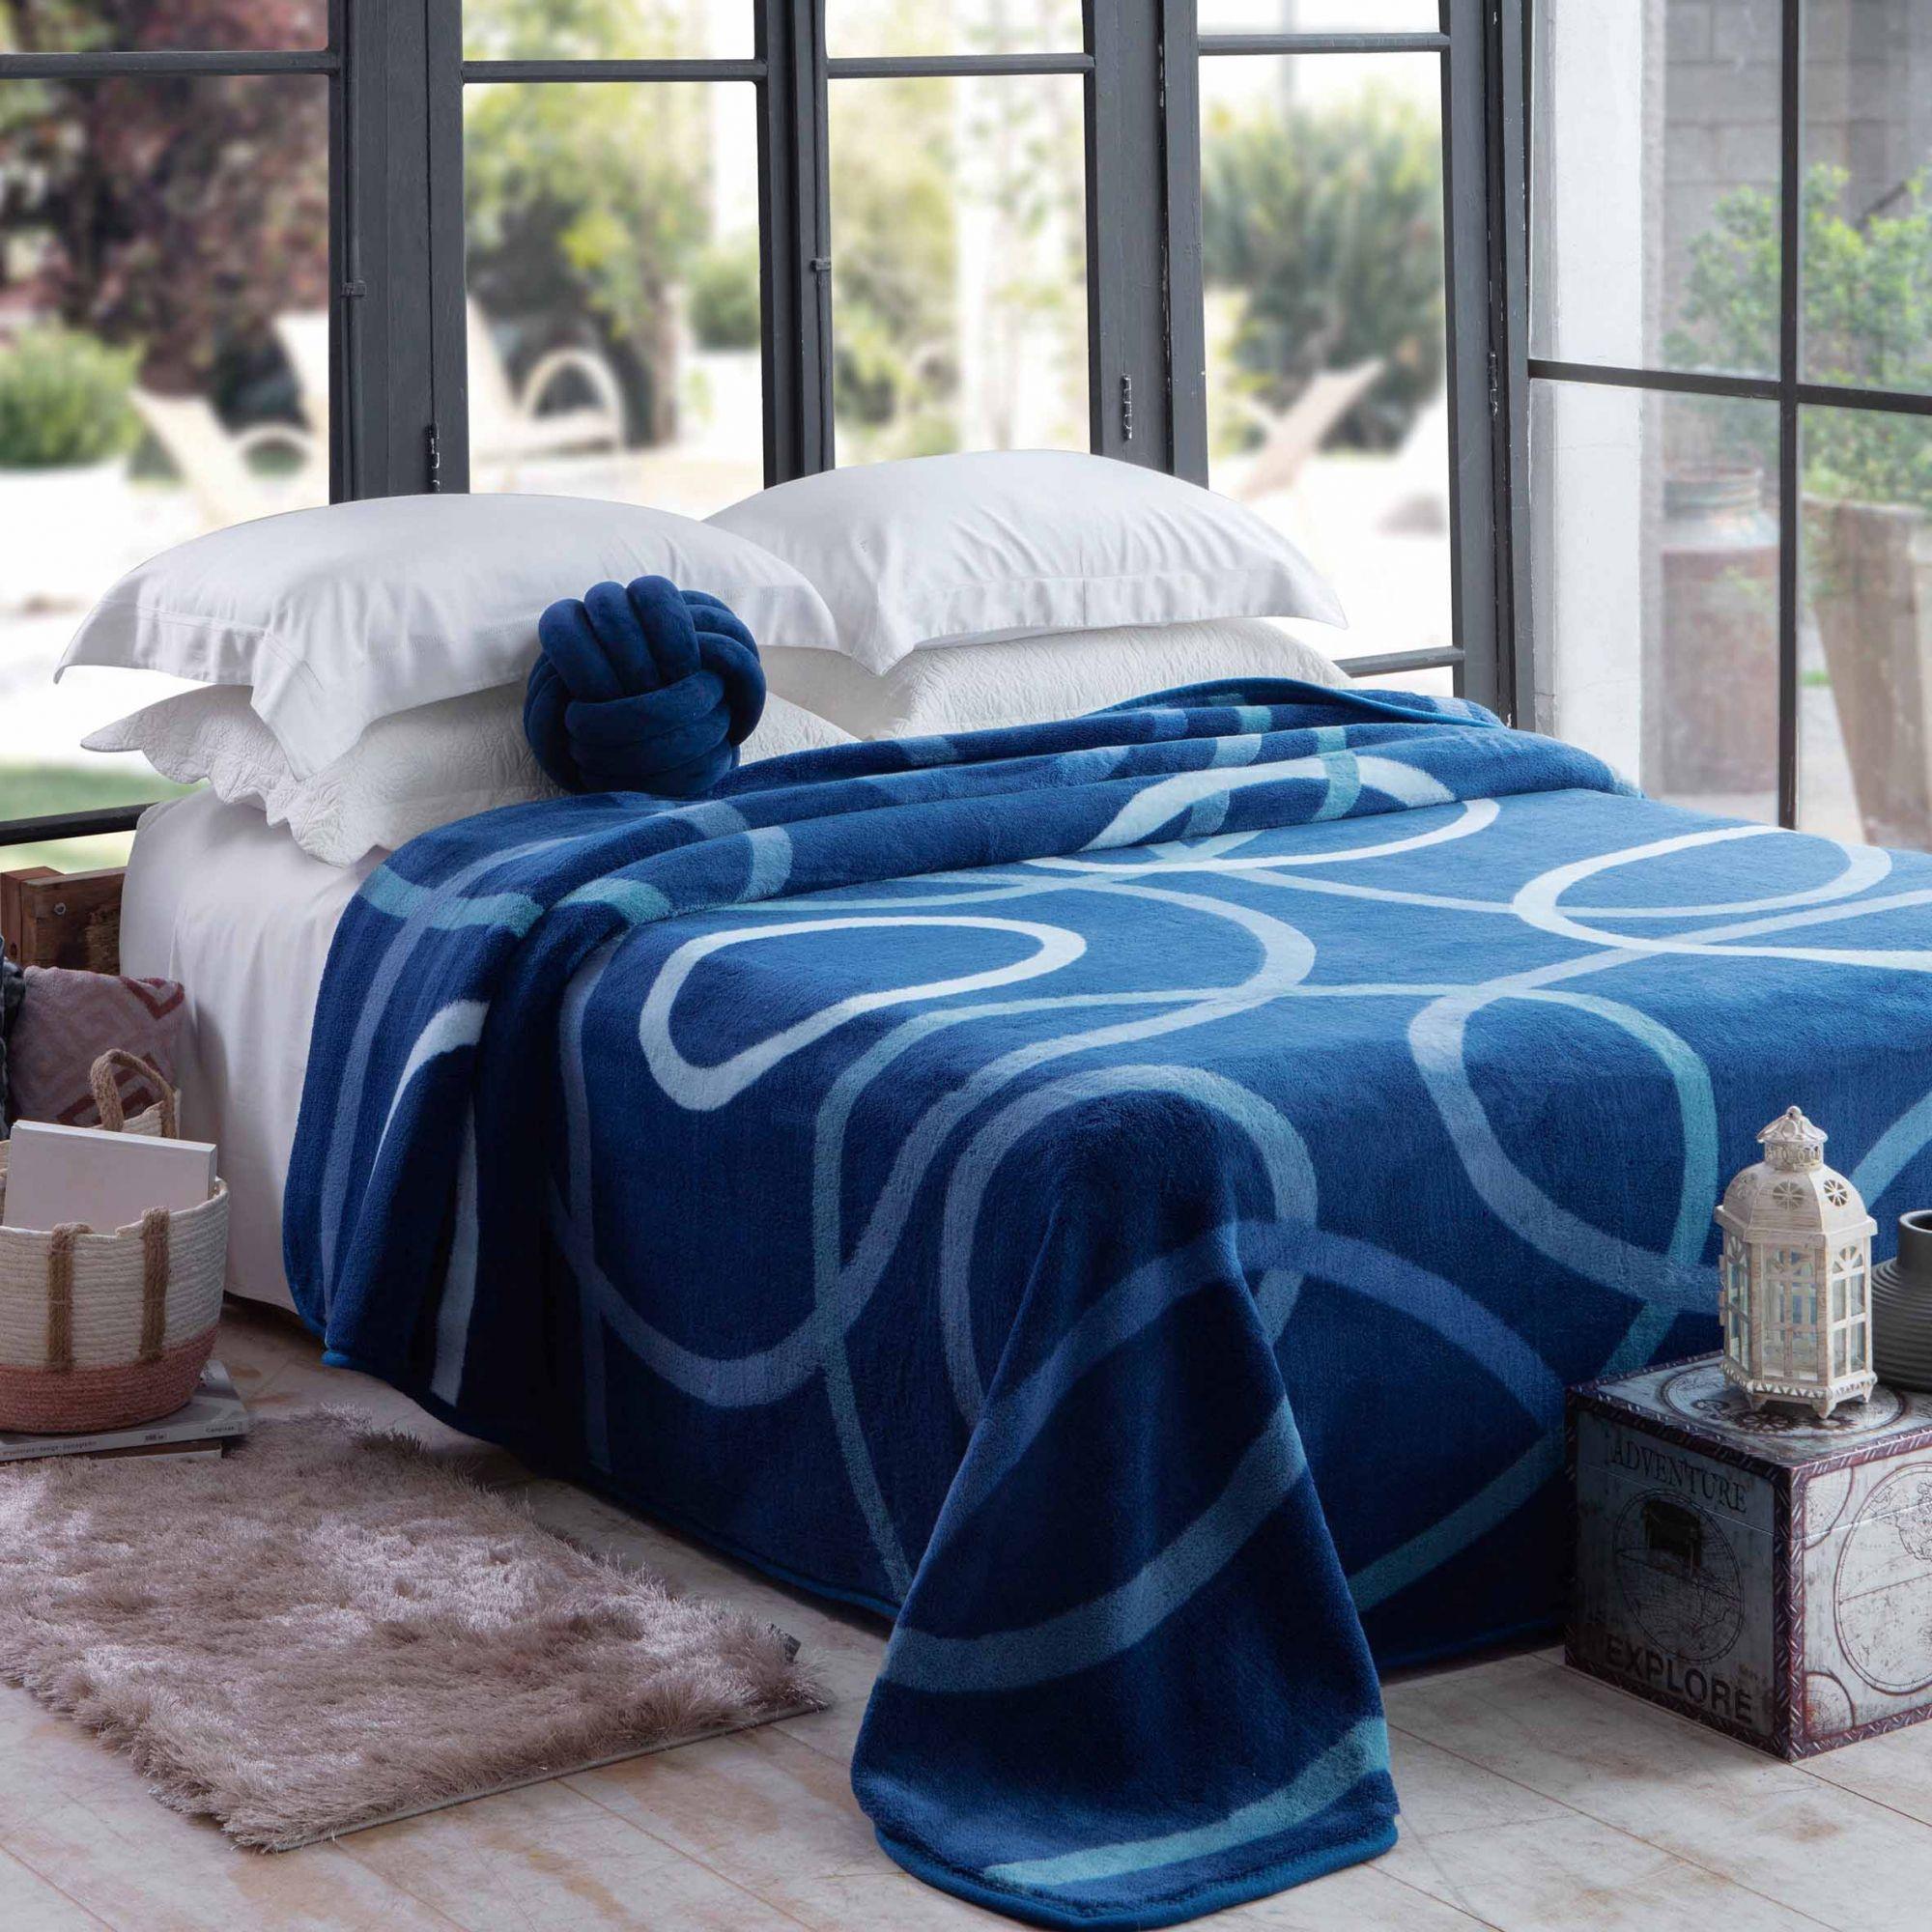 Cobertor Jolitex Casal Kyor Plus 1,80x2,20m Avalon Azul